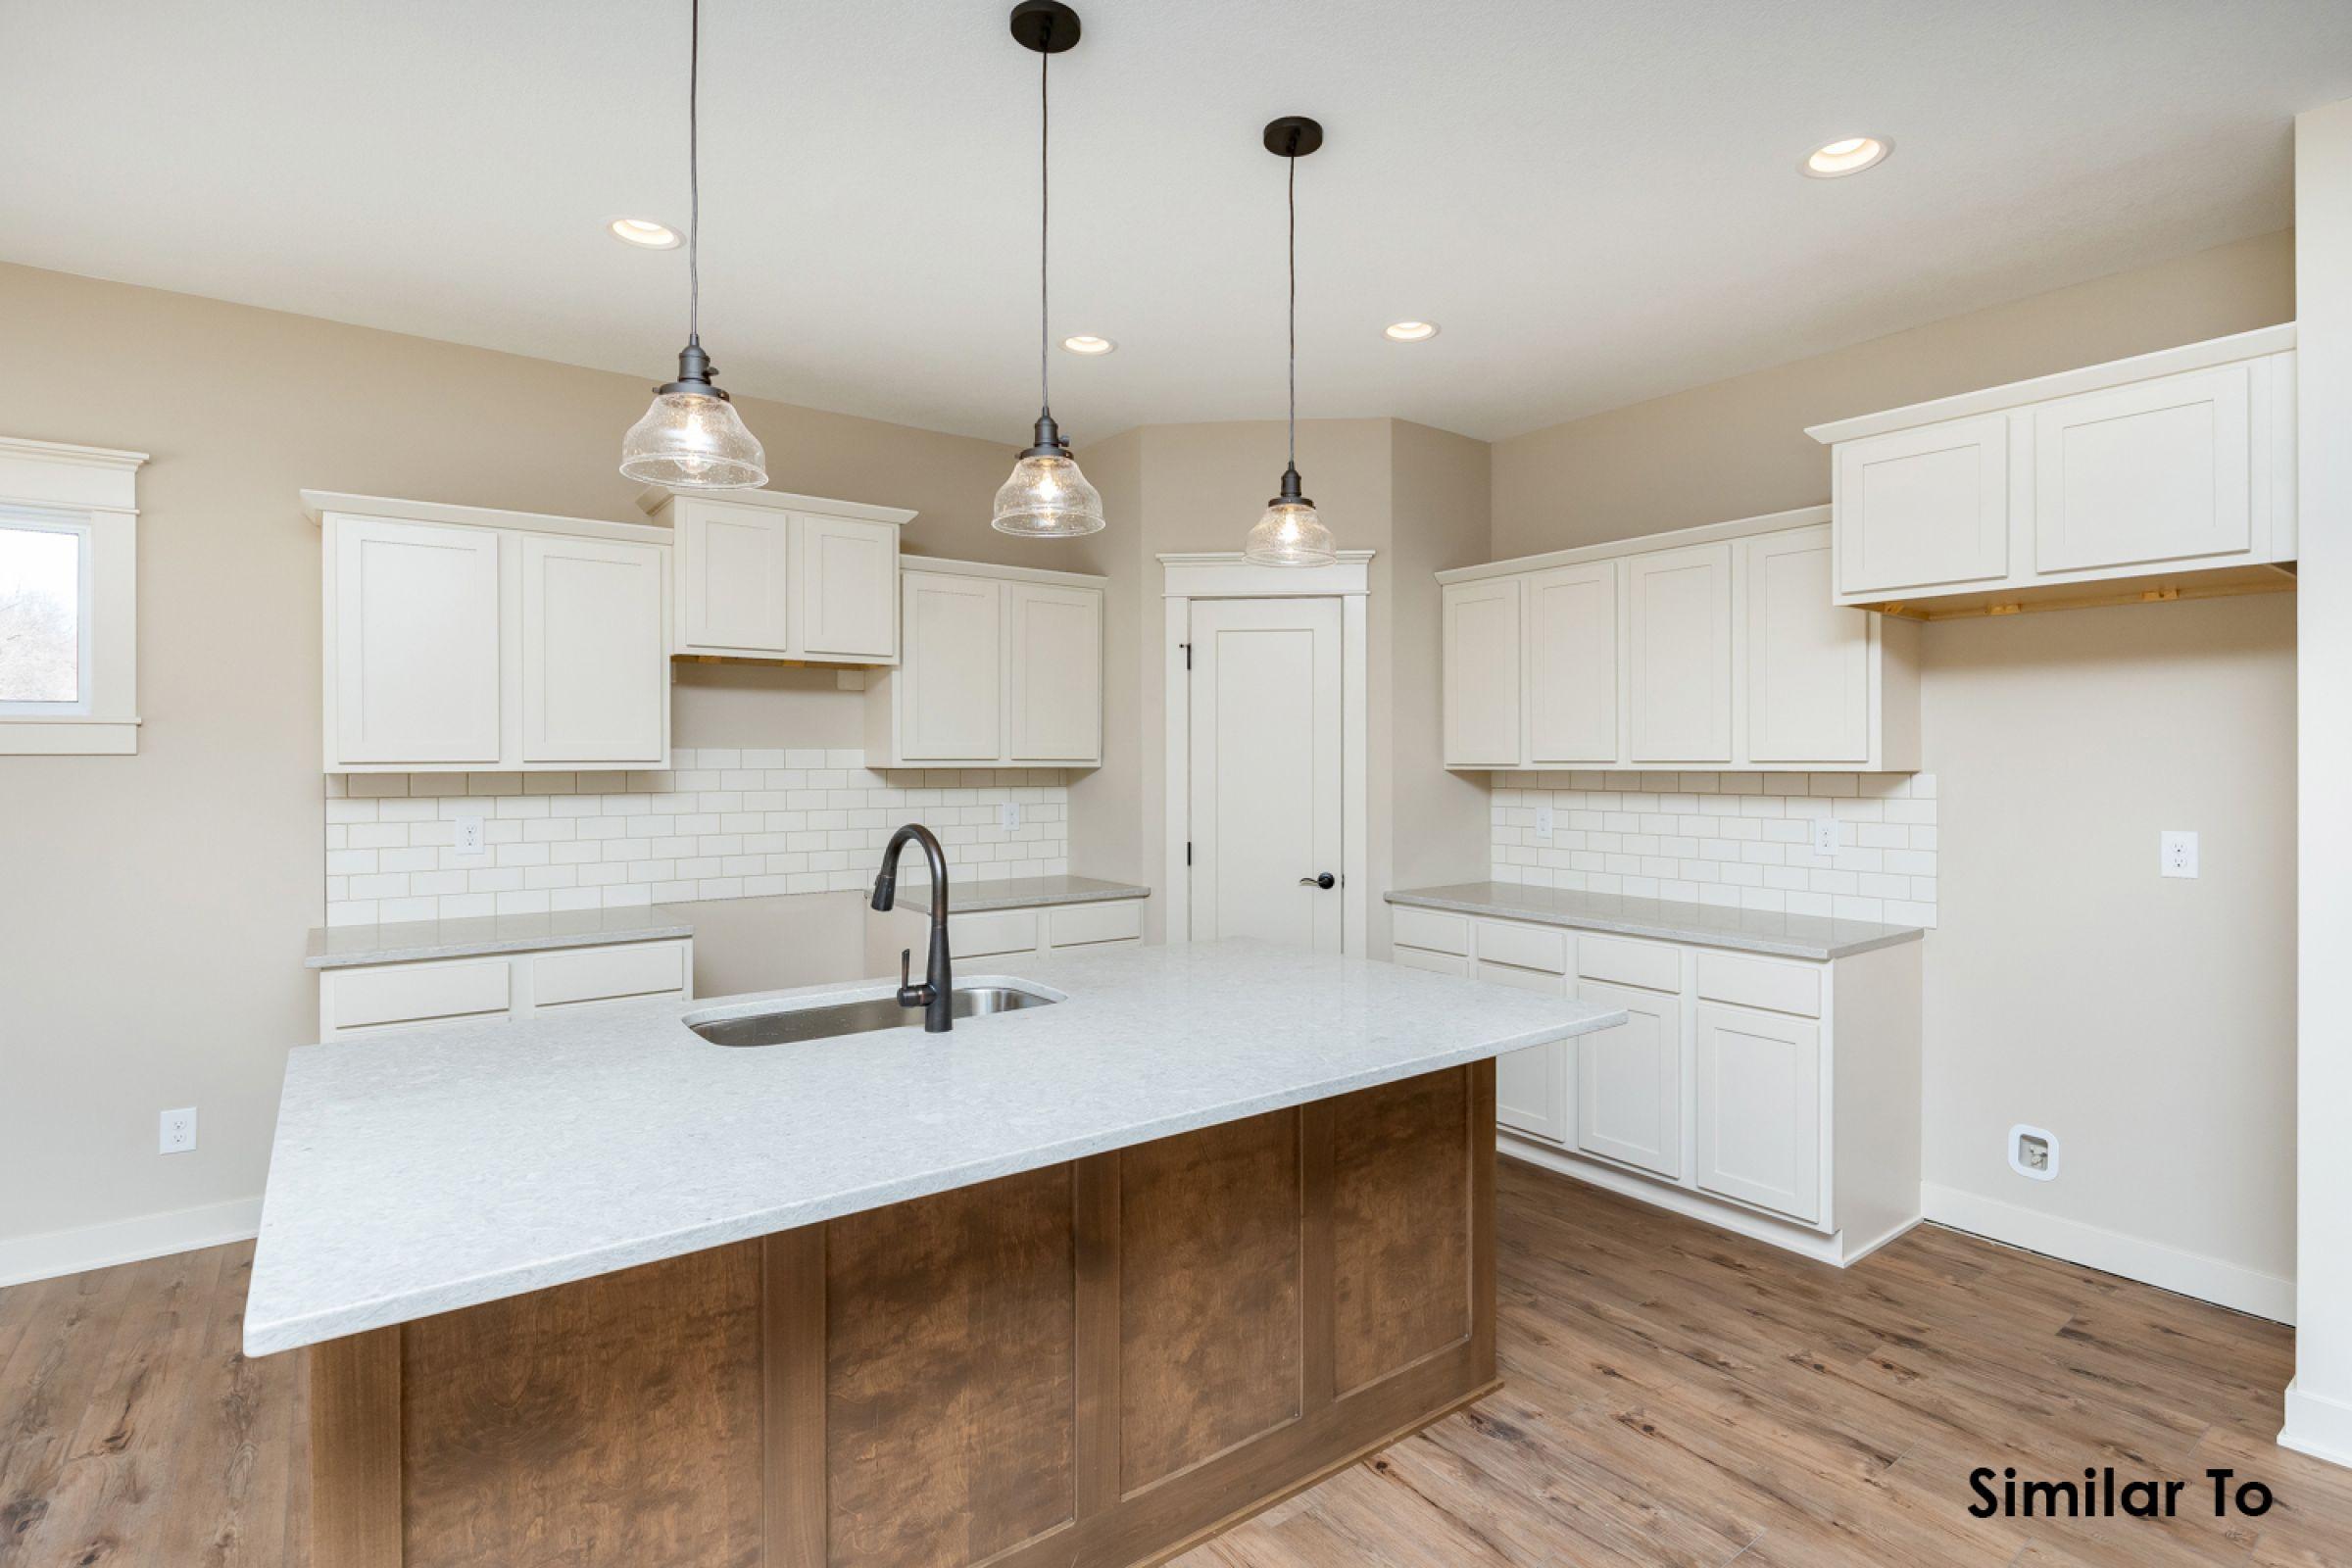 residential-warren-county-iowa-1-acres-listing-number-14995-4-2020-08-03-165347.jpg